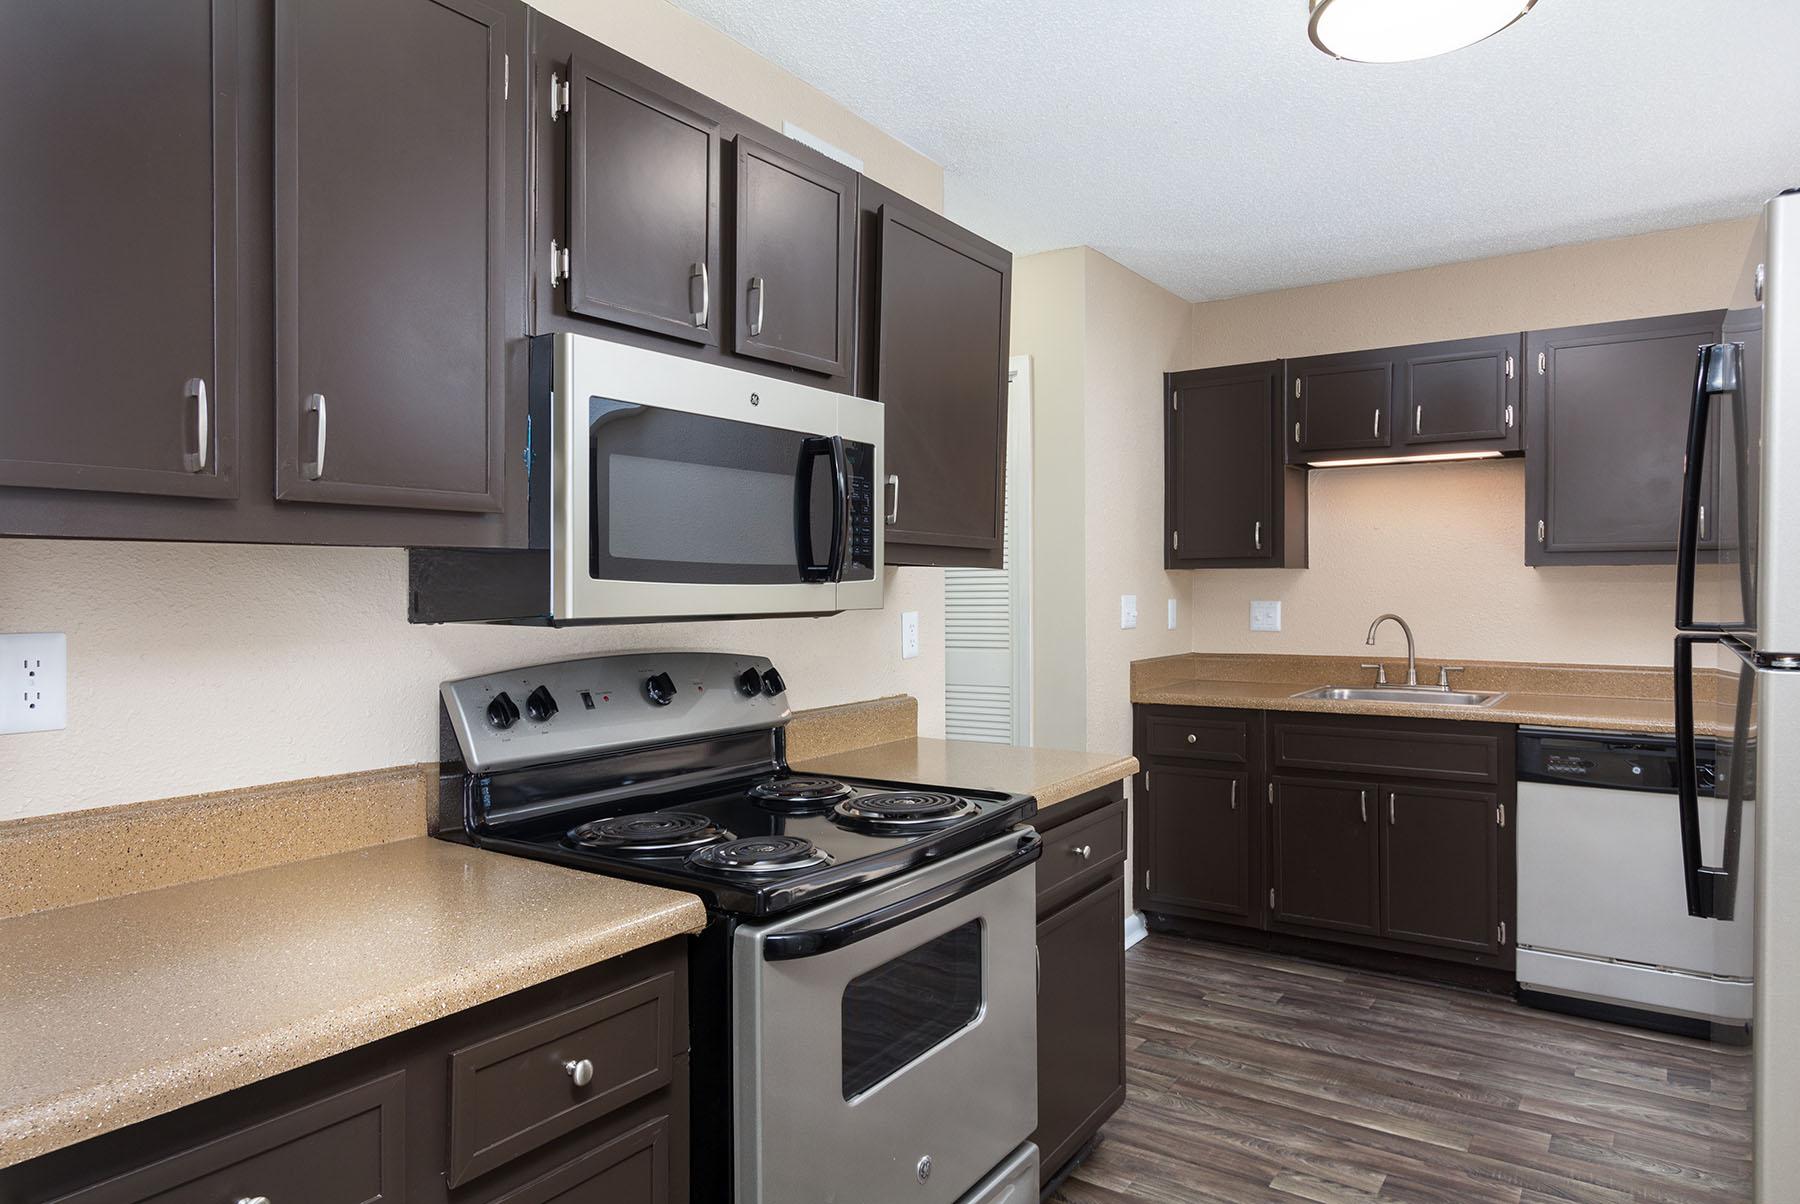 7700 Colquitt Rd Atlanta GA 30350-TwoStory-Kitchen4 copy.jpg